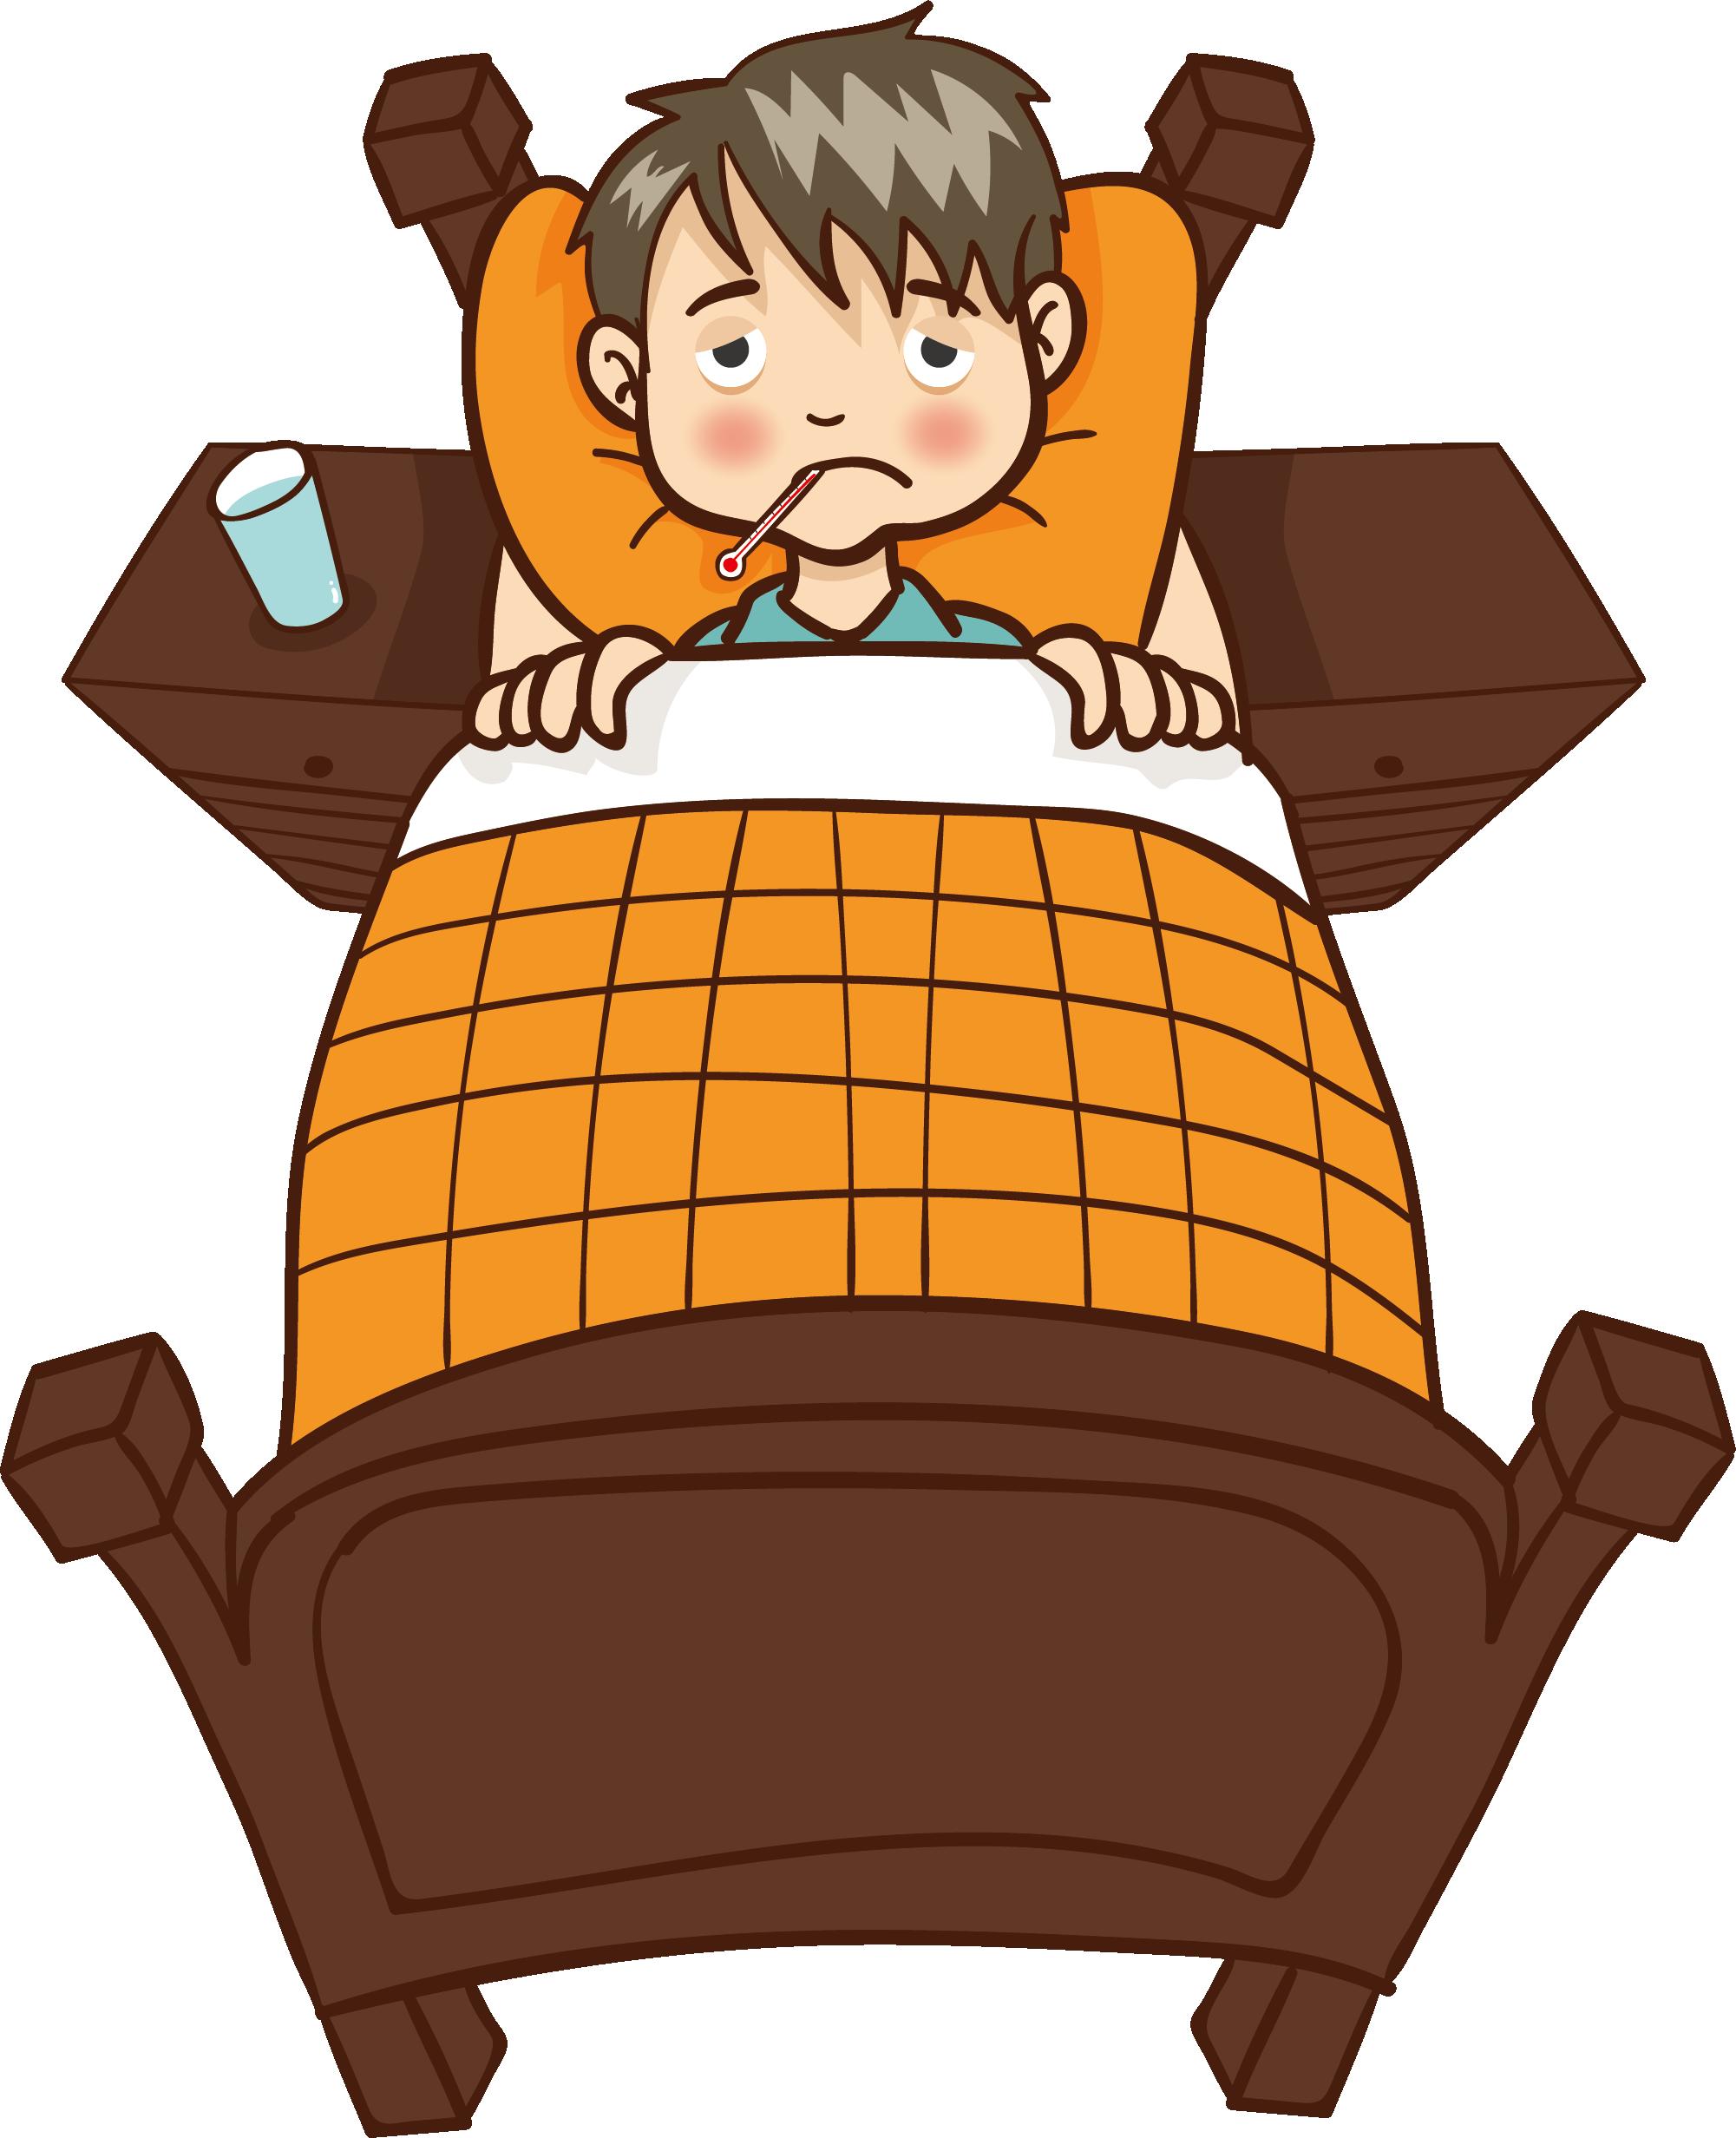 Clipart thermometer cartoon food. Child body temperature sick